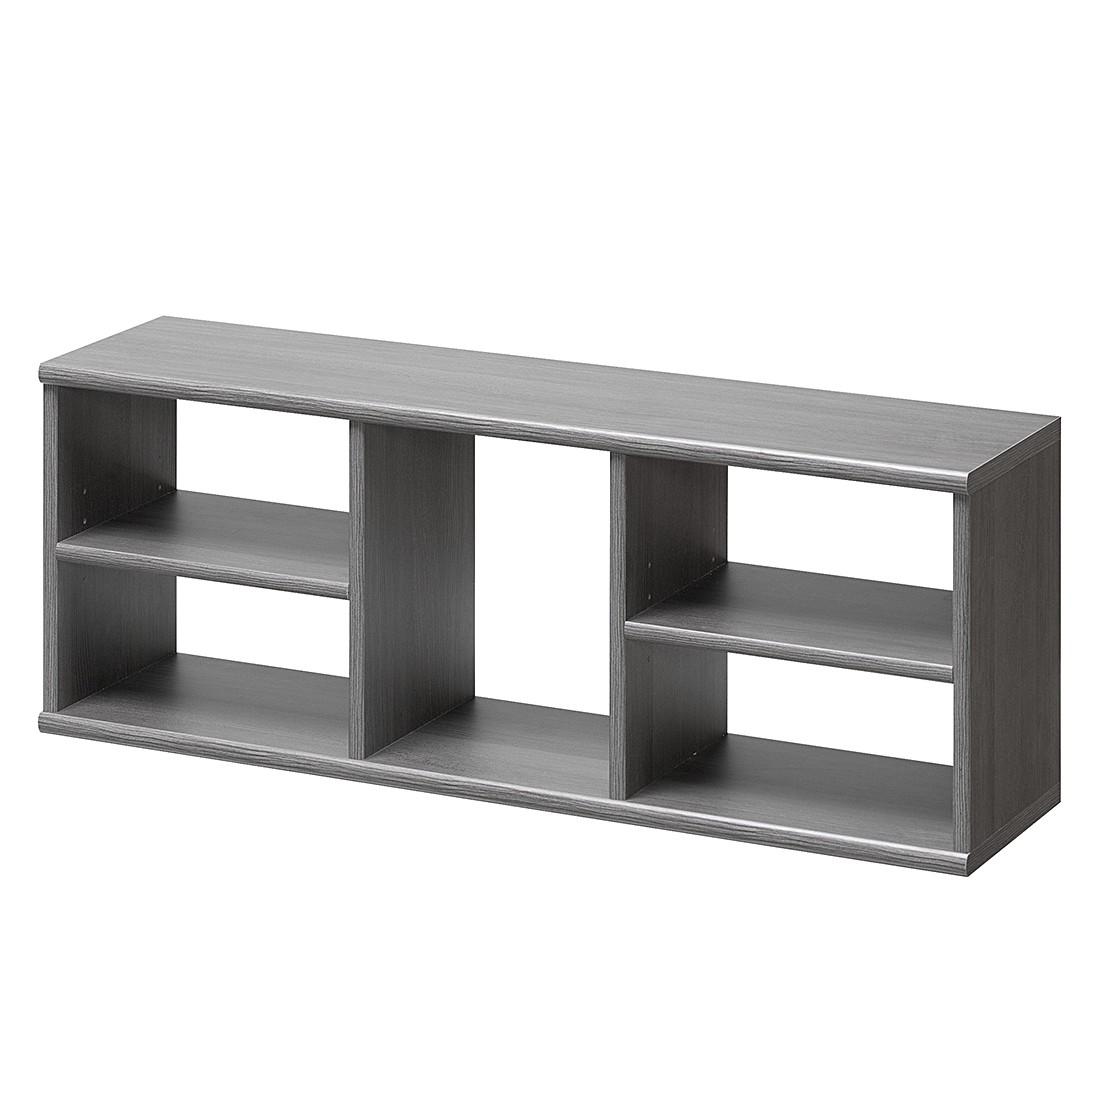 wandkast ikea hoogglans kopen online internetwinkel. Black Bedroom Furniture Sets. Home Design Ideas